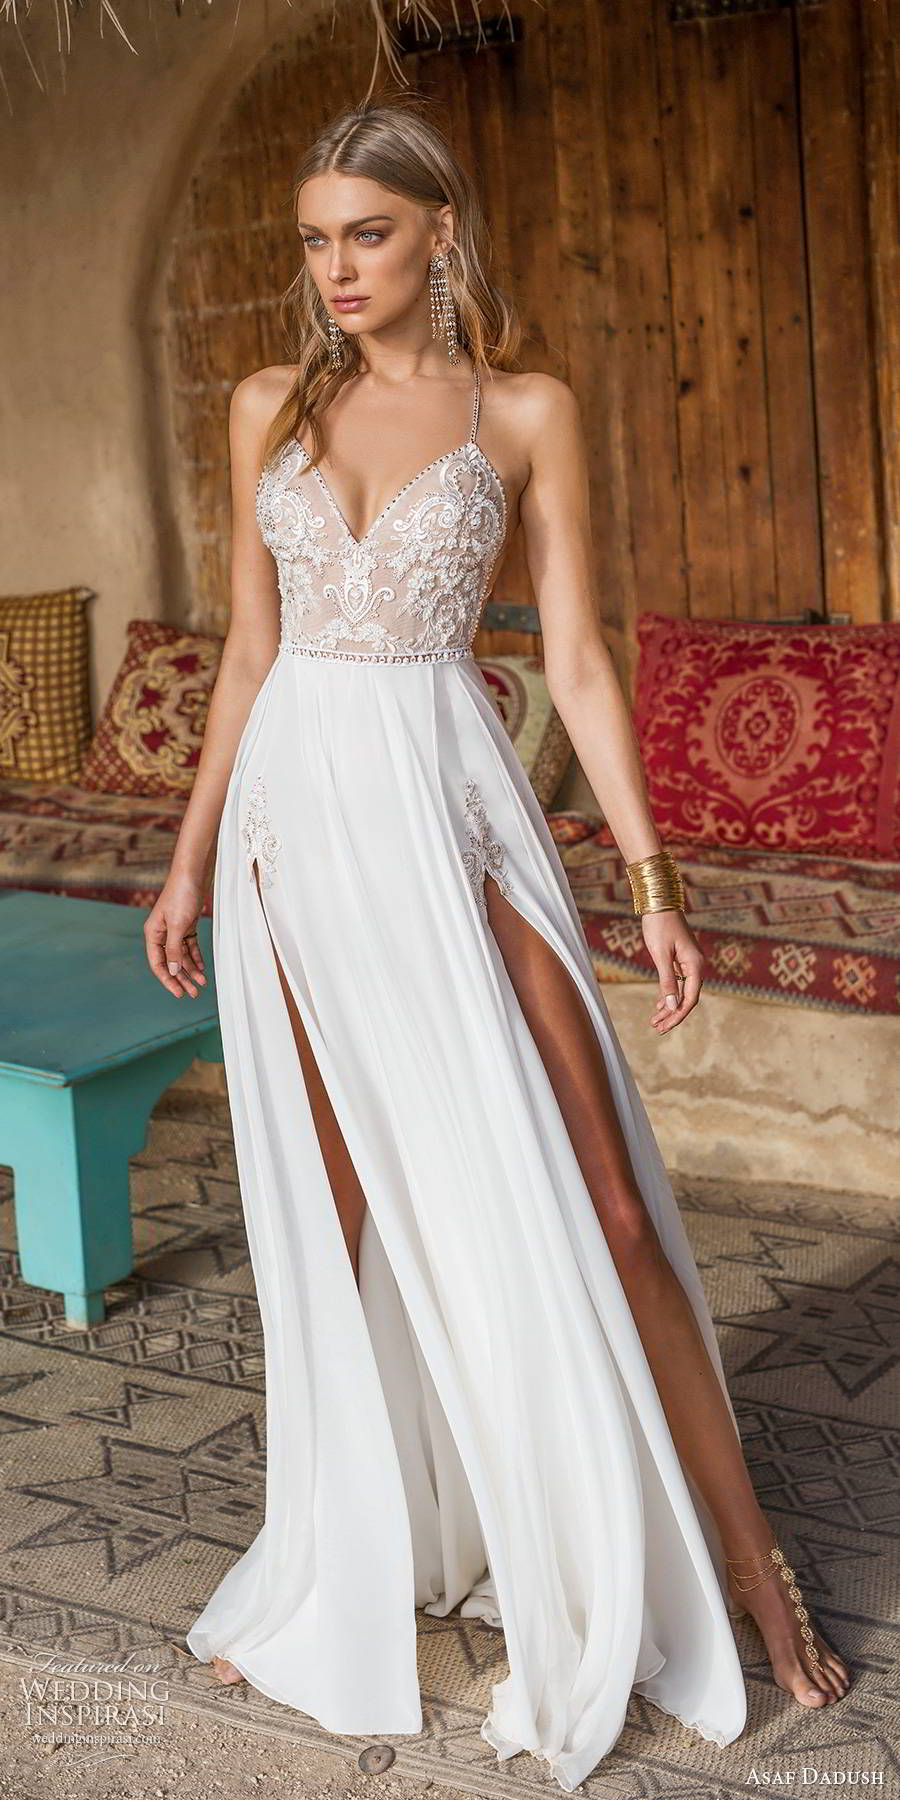 asaf dadush 2019 bridal sleeveless thin straps v neckline embellished bodice double slit skirt glam sexy a line wedding dress (5) mv